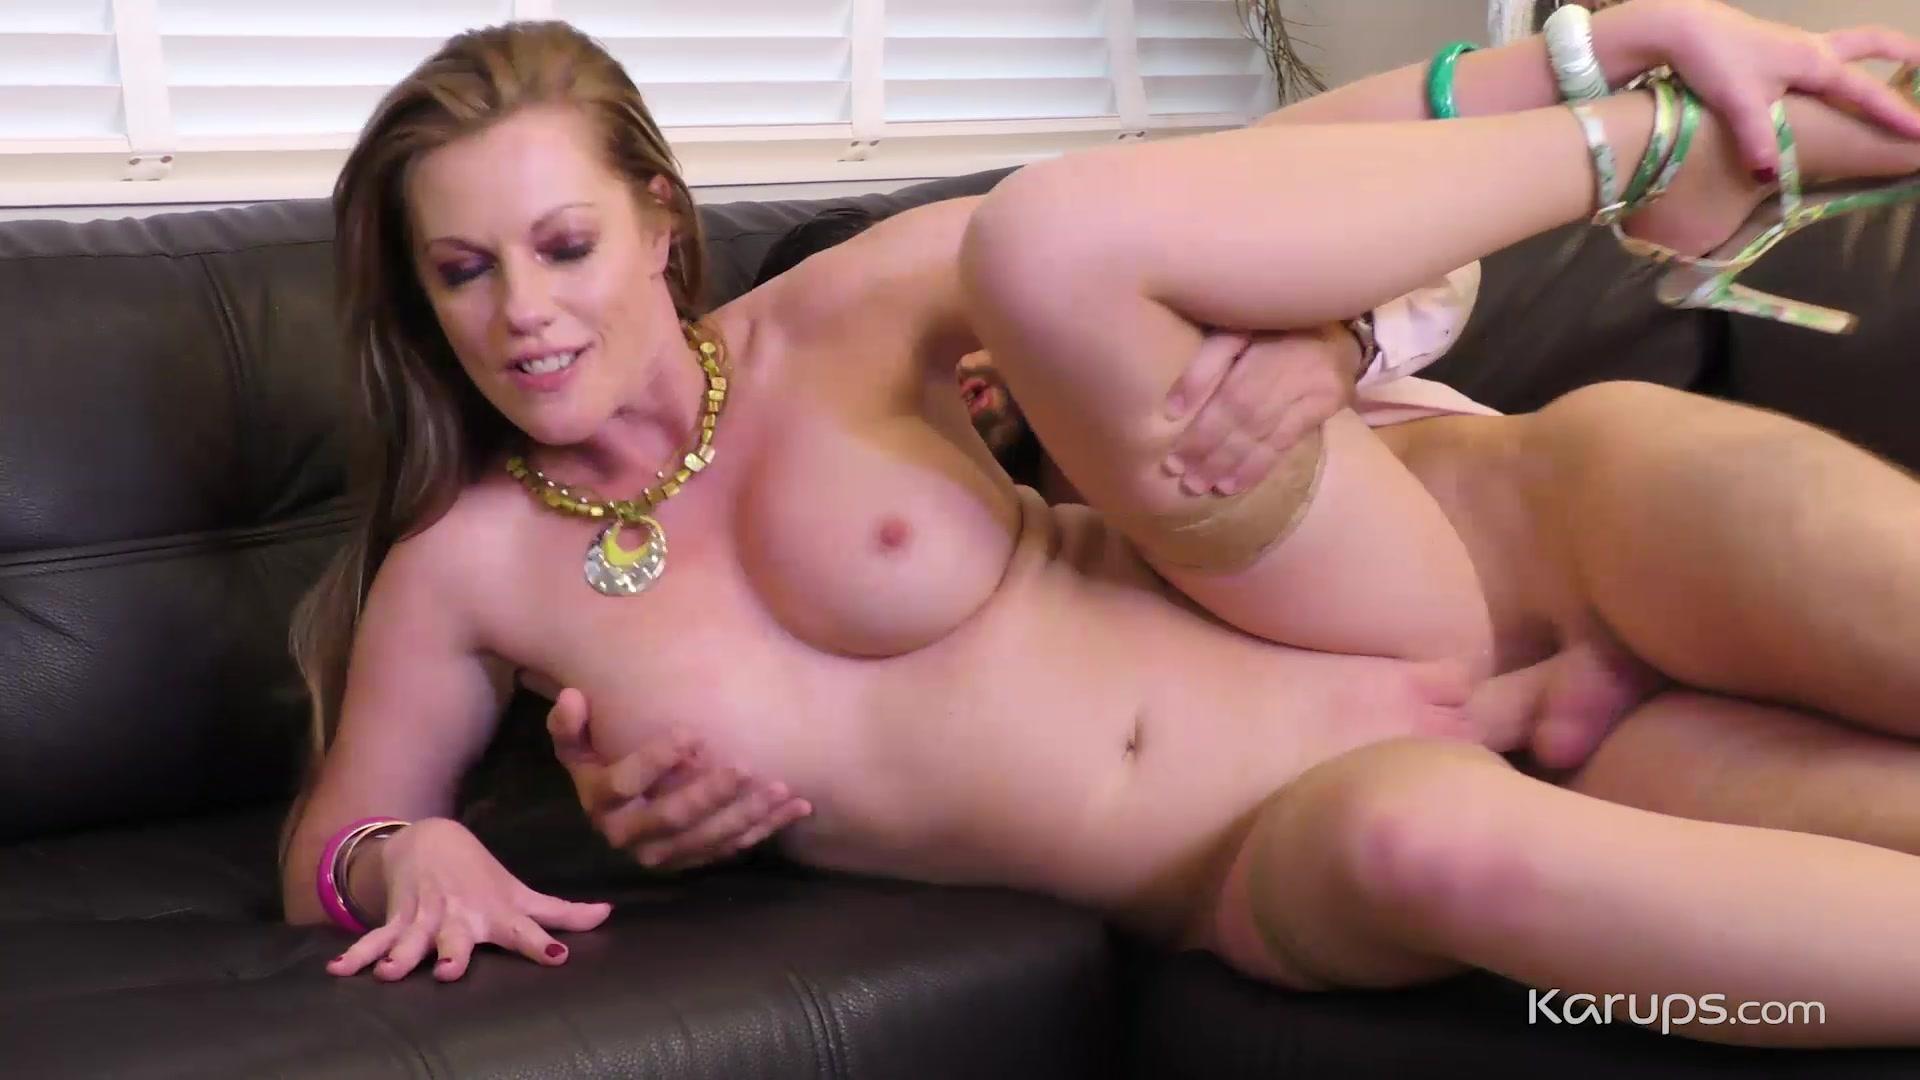 Holly Kiss - Karups is that justin bieber gay porn